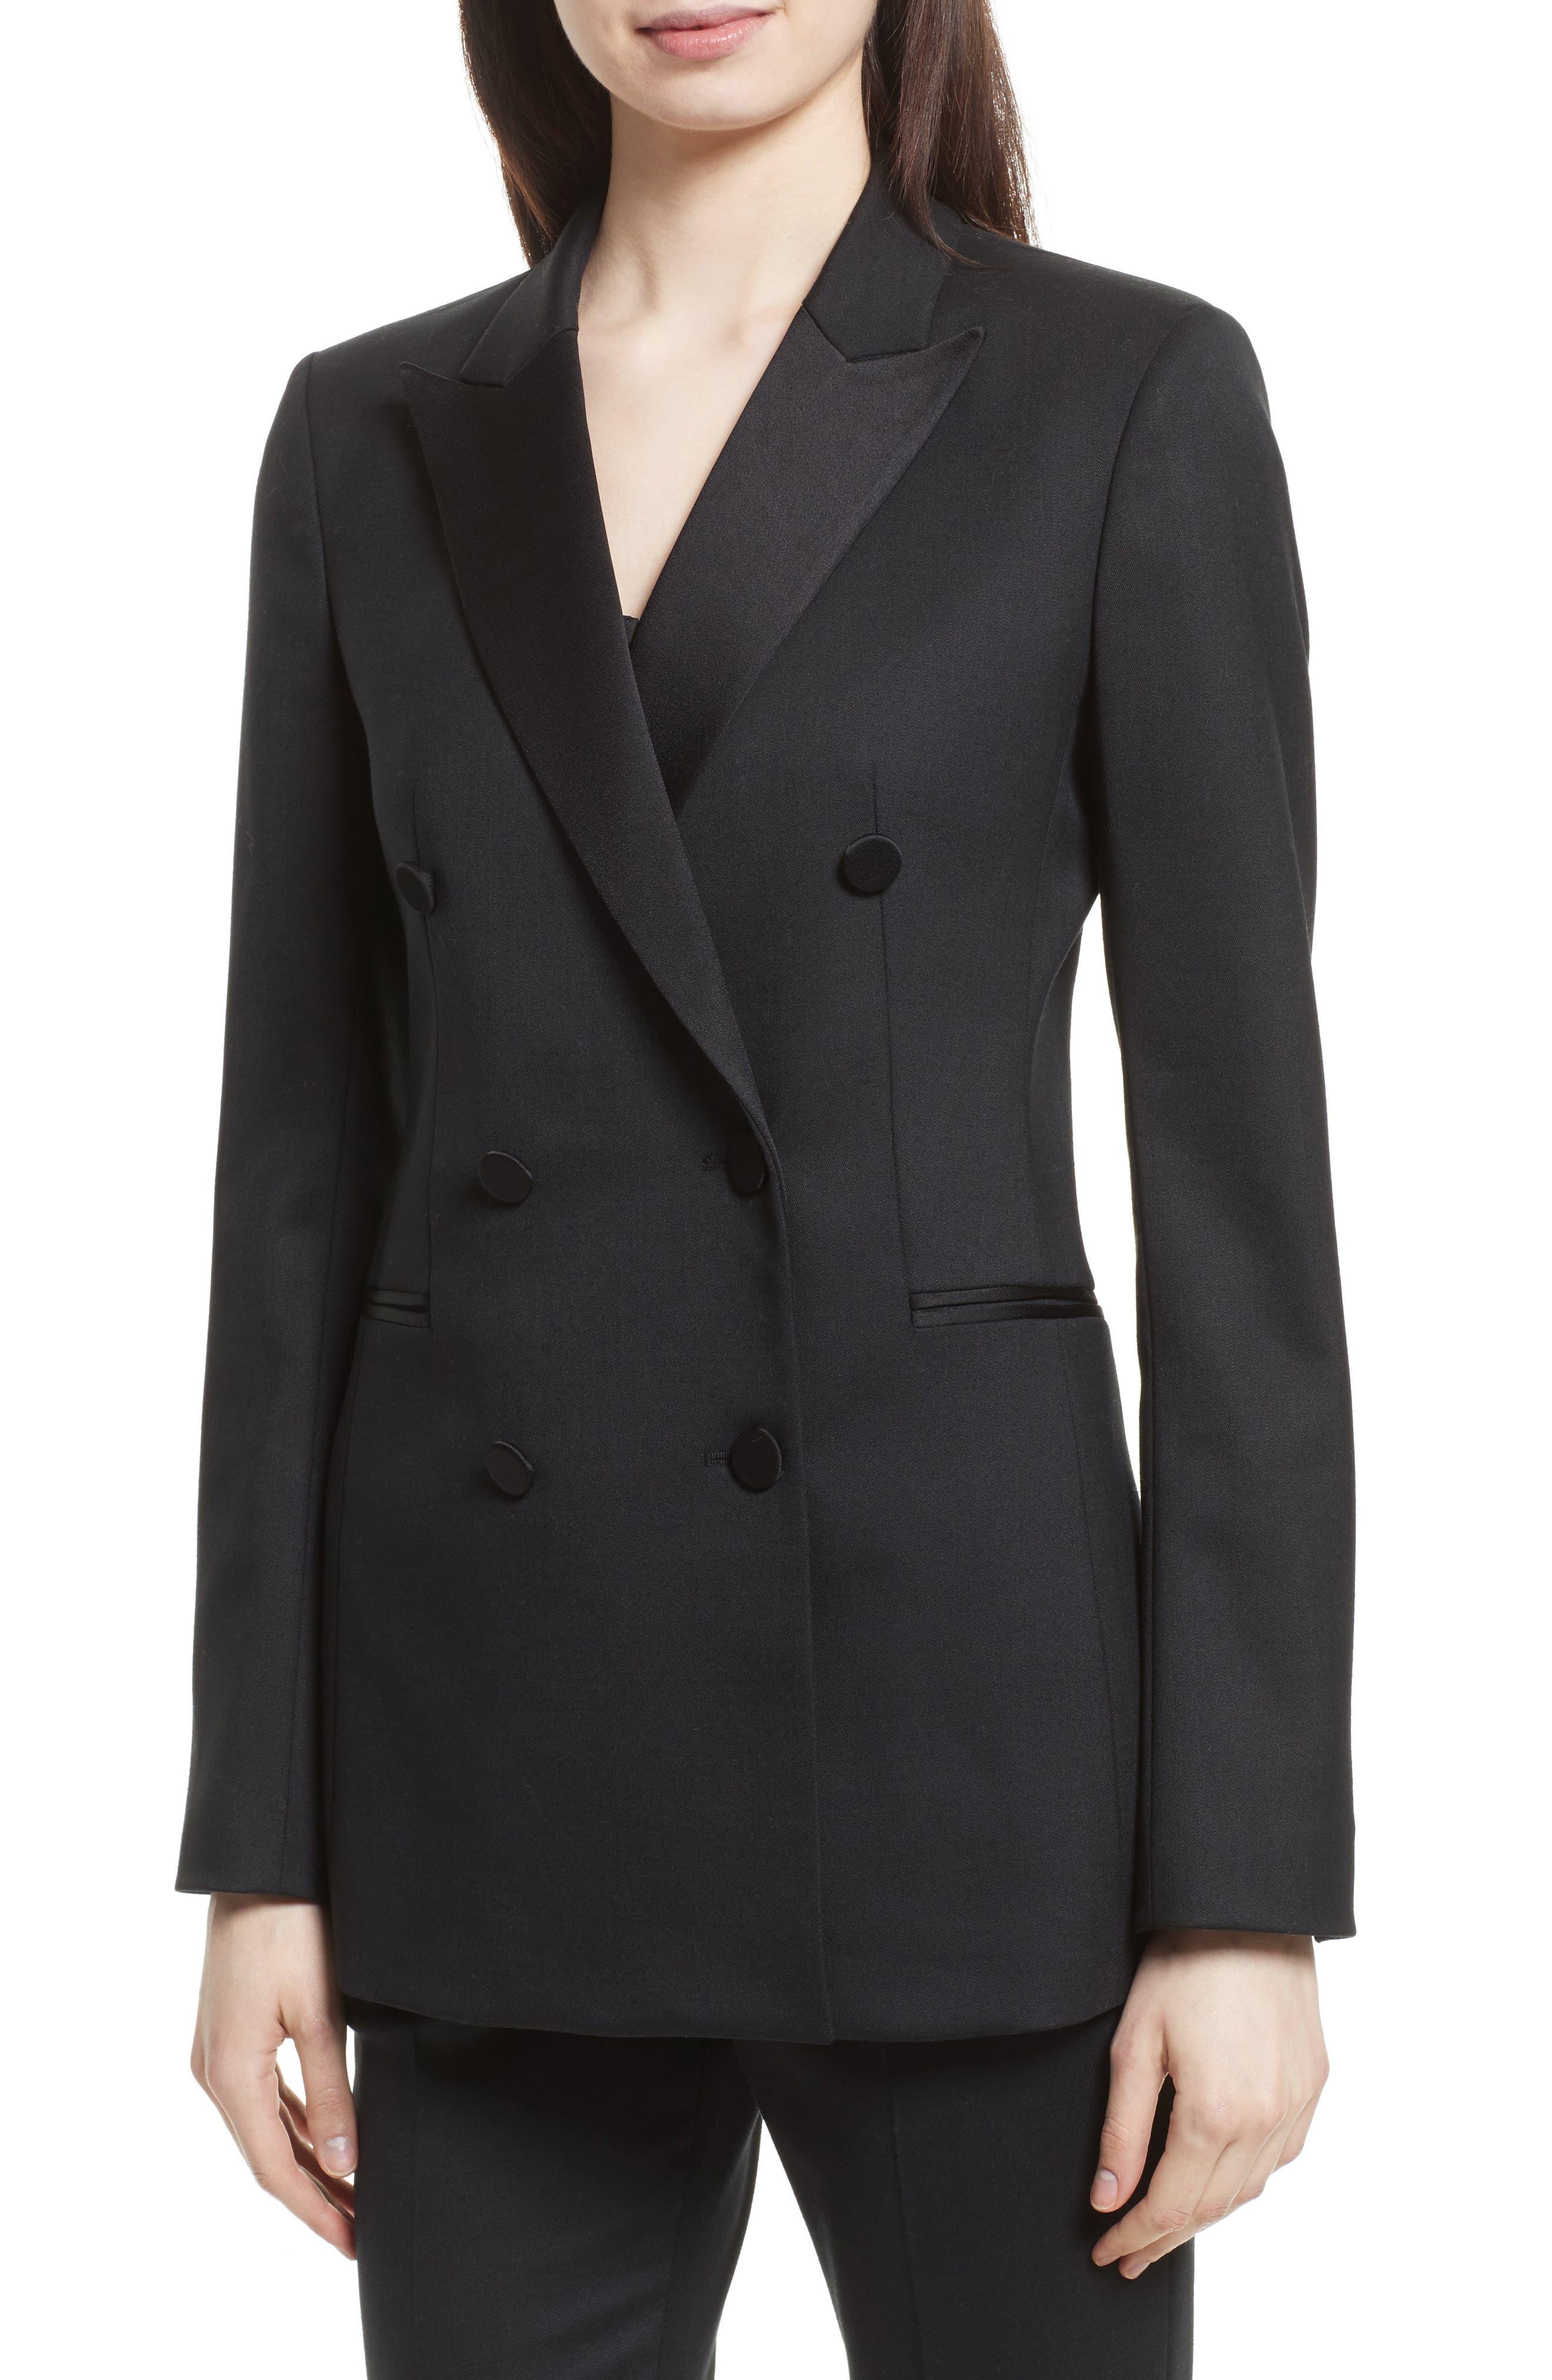 Wool Blend Tuxedo Jacket,                             Alternate thumbnail 4, color,                             001